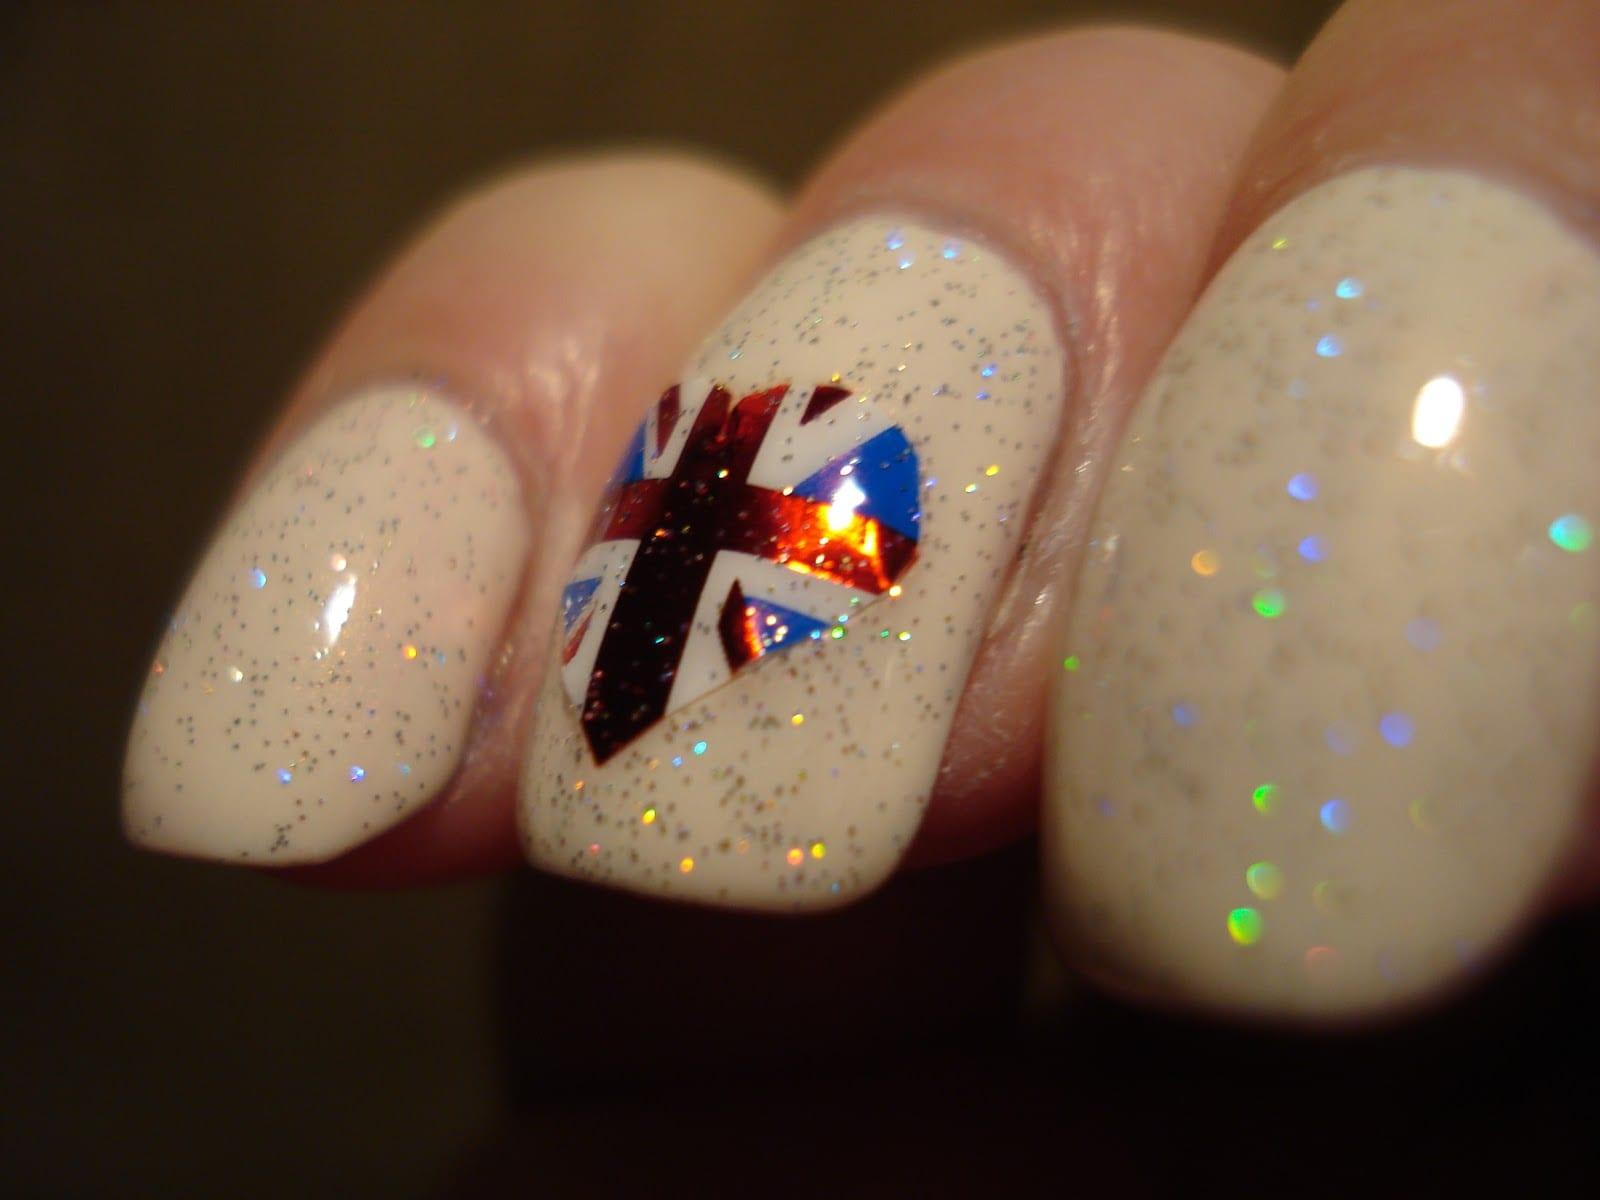 Ногти дизайн российский флаг фото